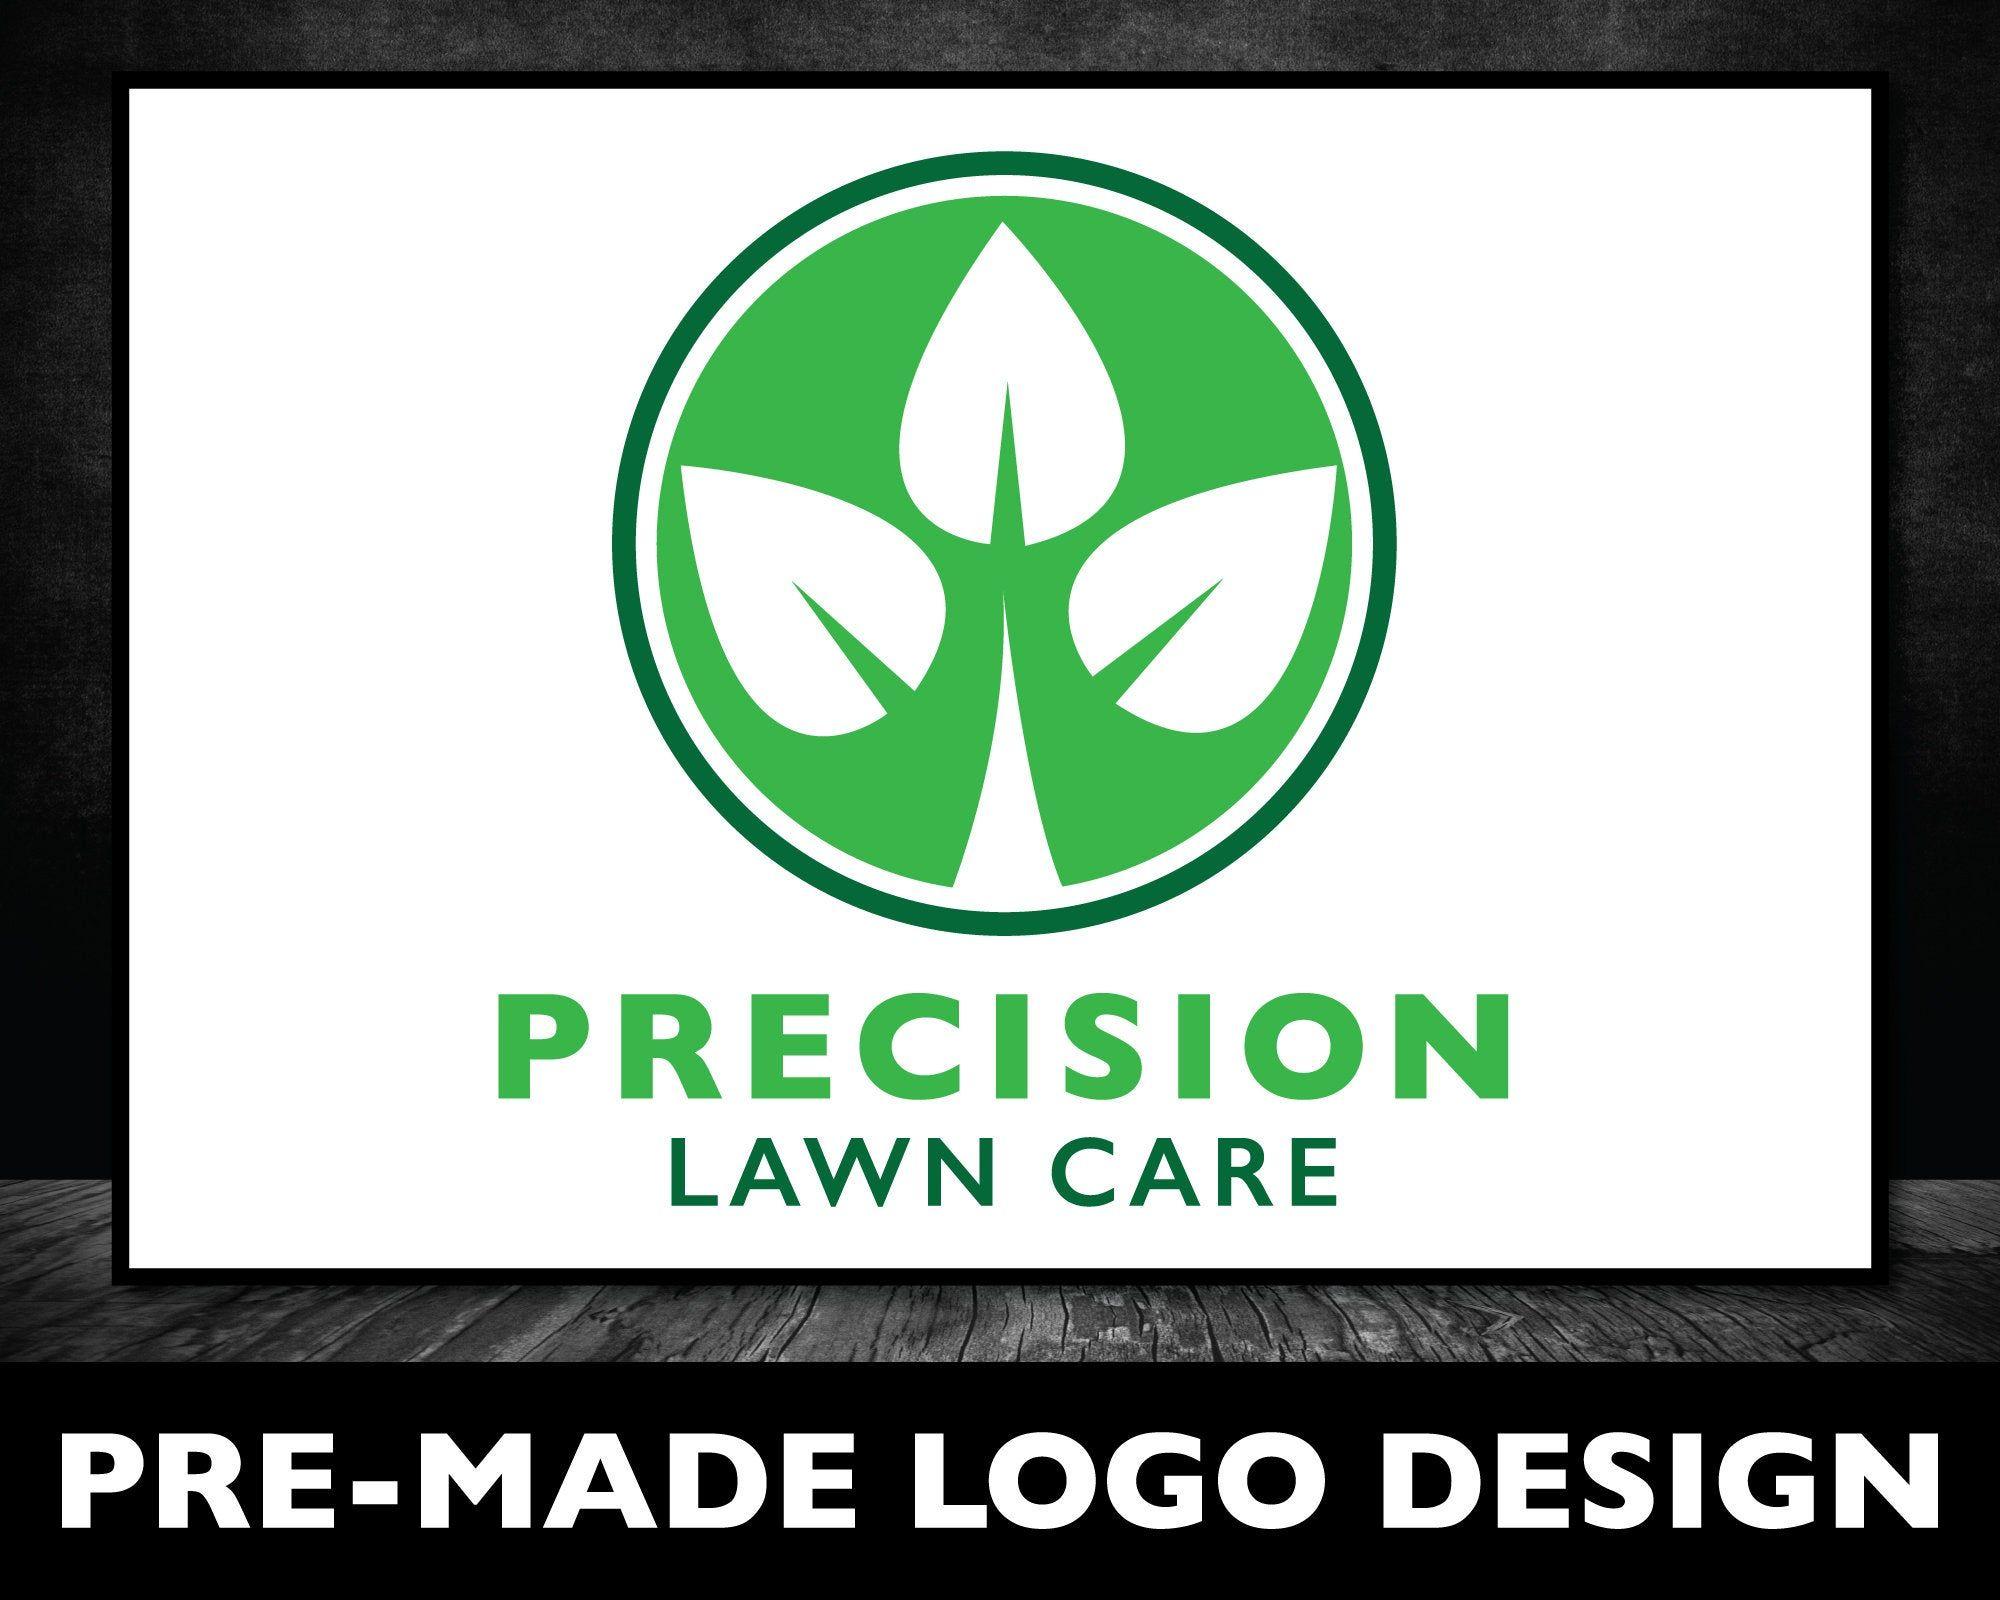 Landscape Business Logo   Tree Service Business   Landscape Design   Landscaping Design   Professional Services   Custom   Modern Logo